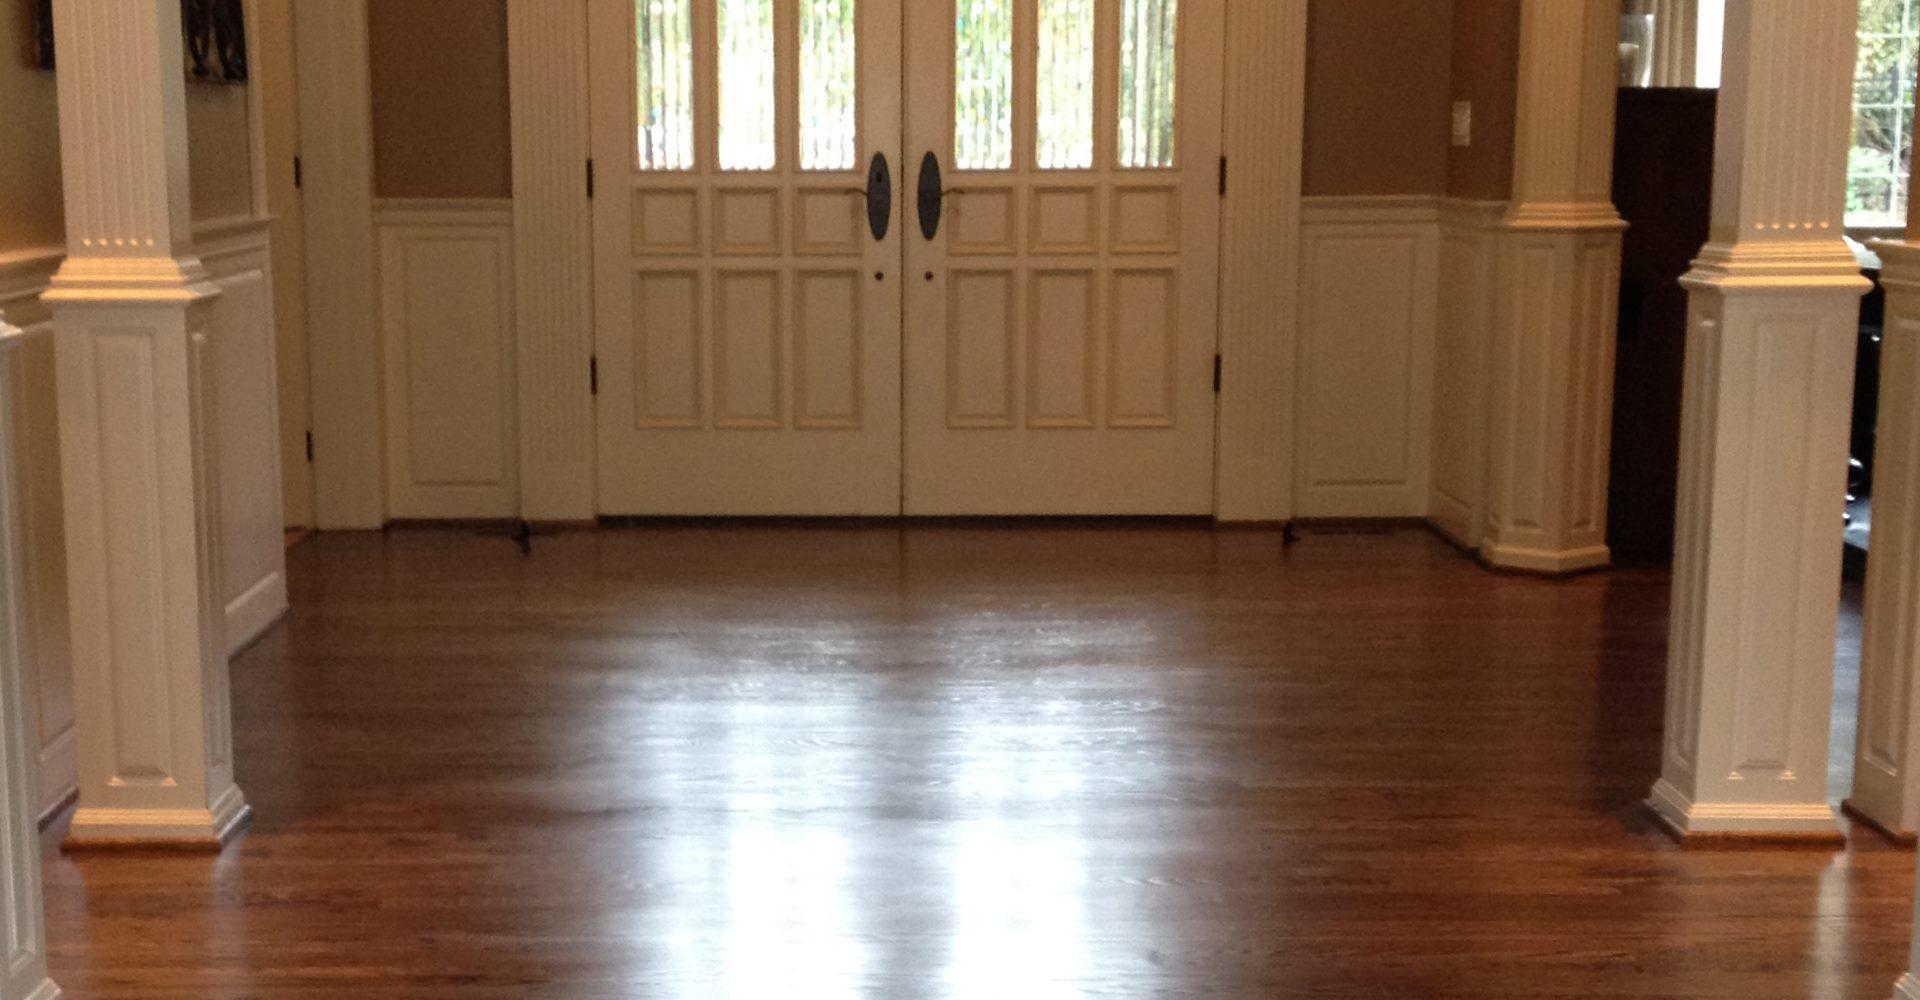 Eastside Hardwood - Hardwood Floor installation, repair and maintenance - Kenmore Washington